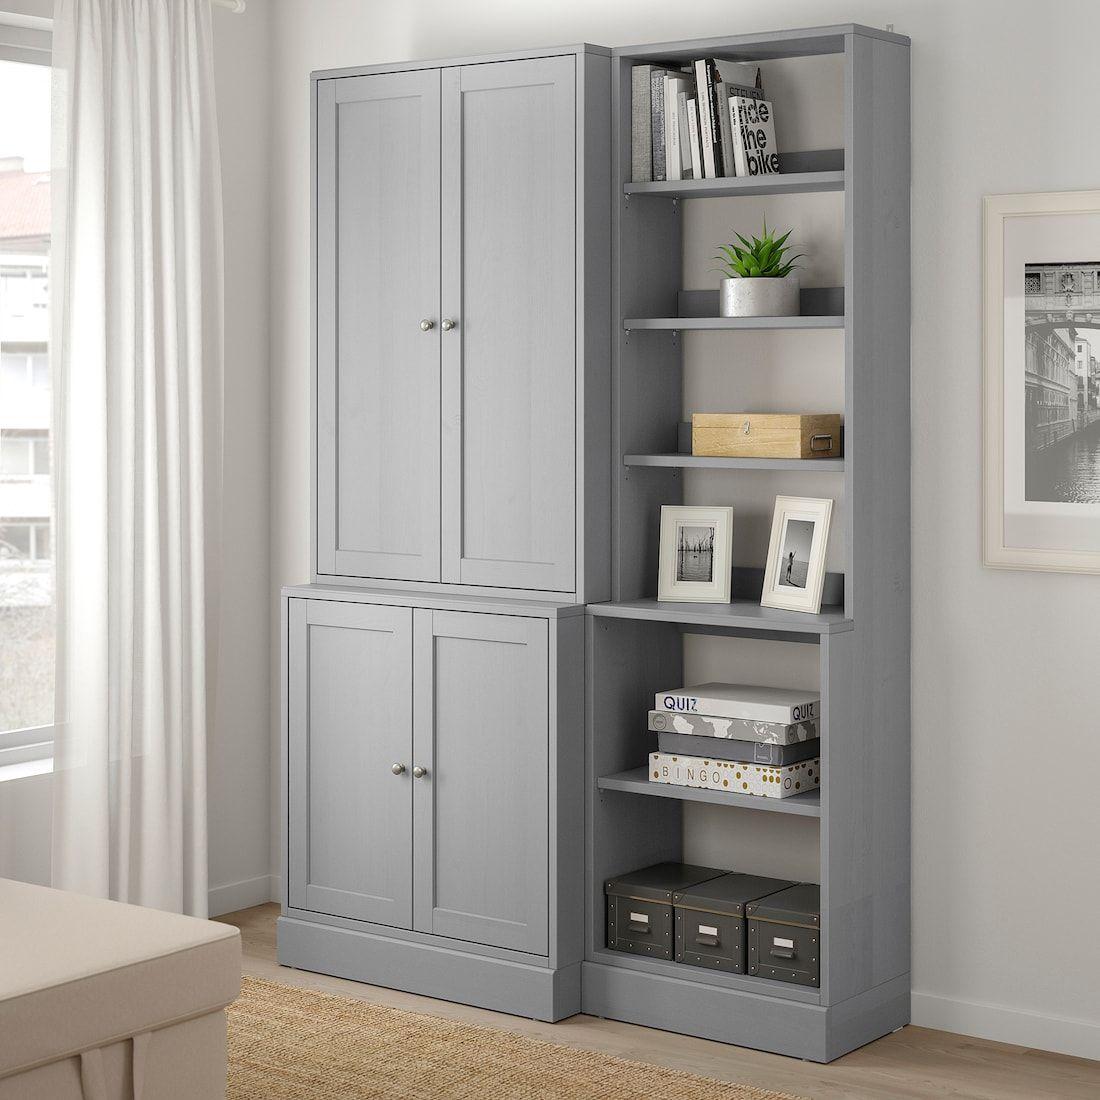 Havsta Storage Combination Gray, Living Room Storage Cupboards Ikea